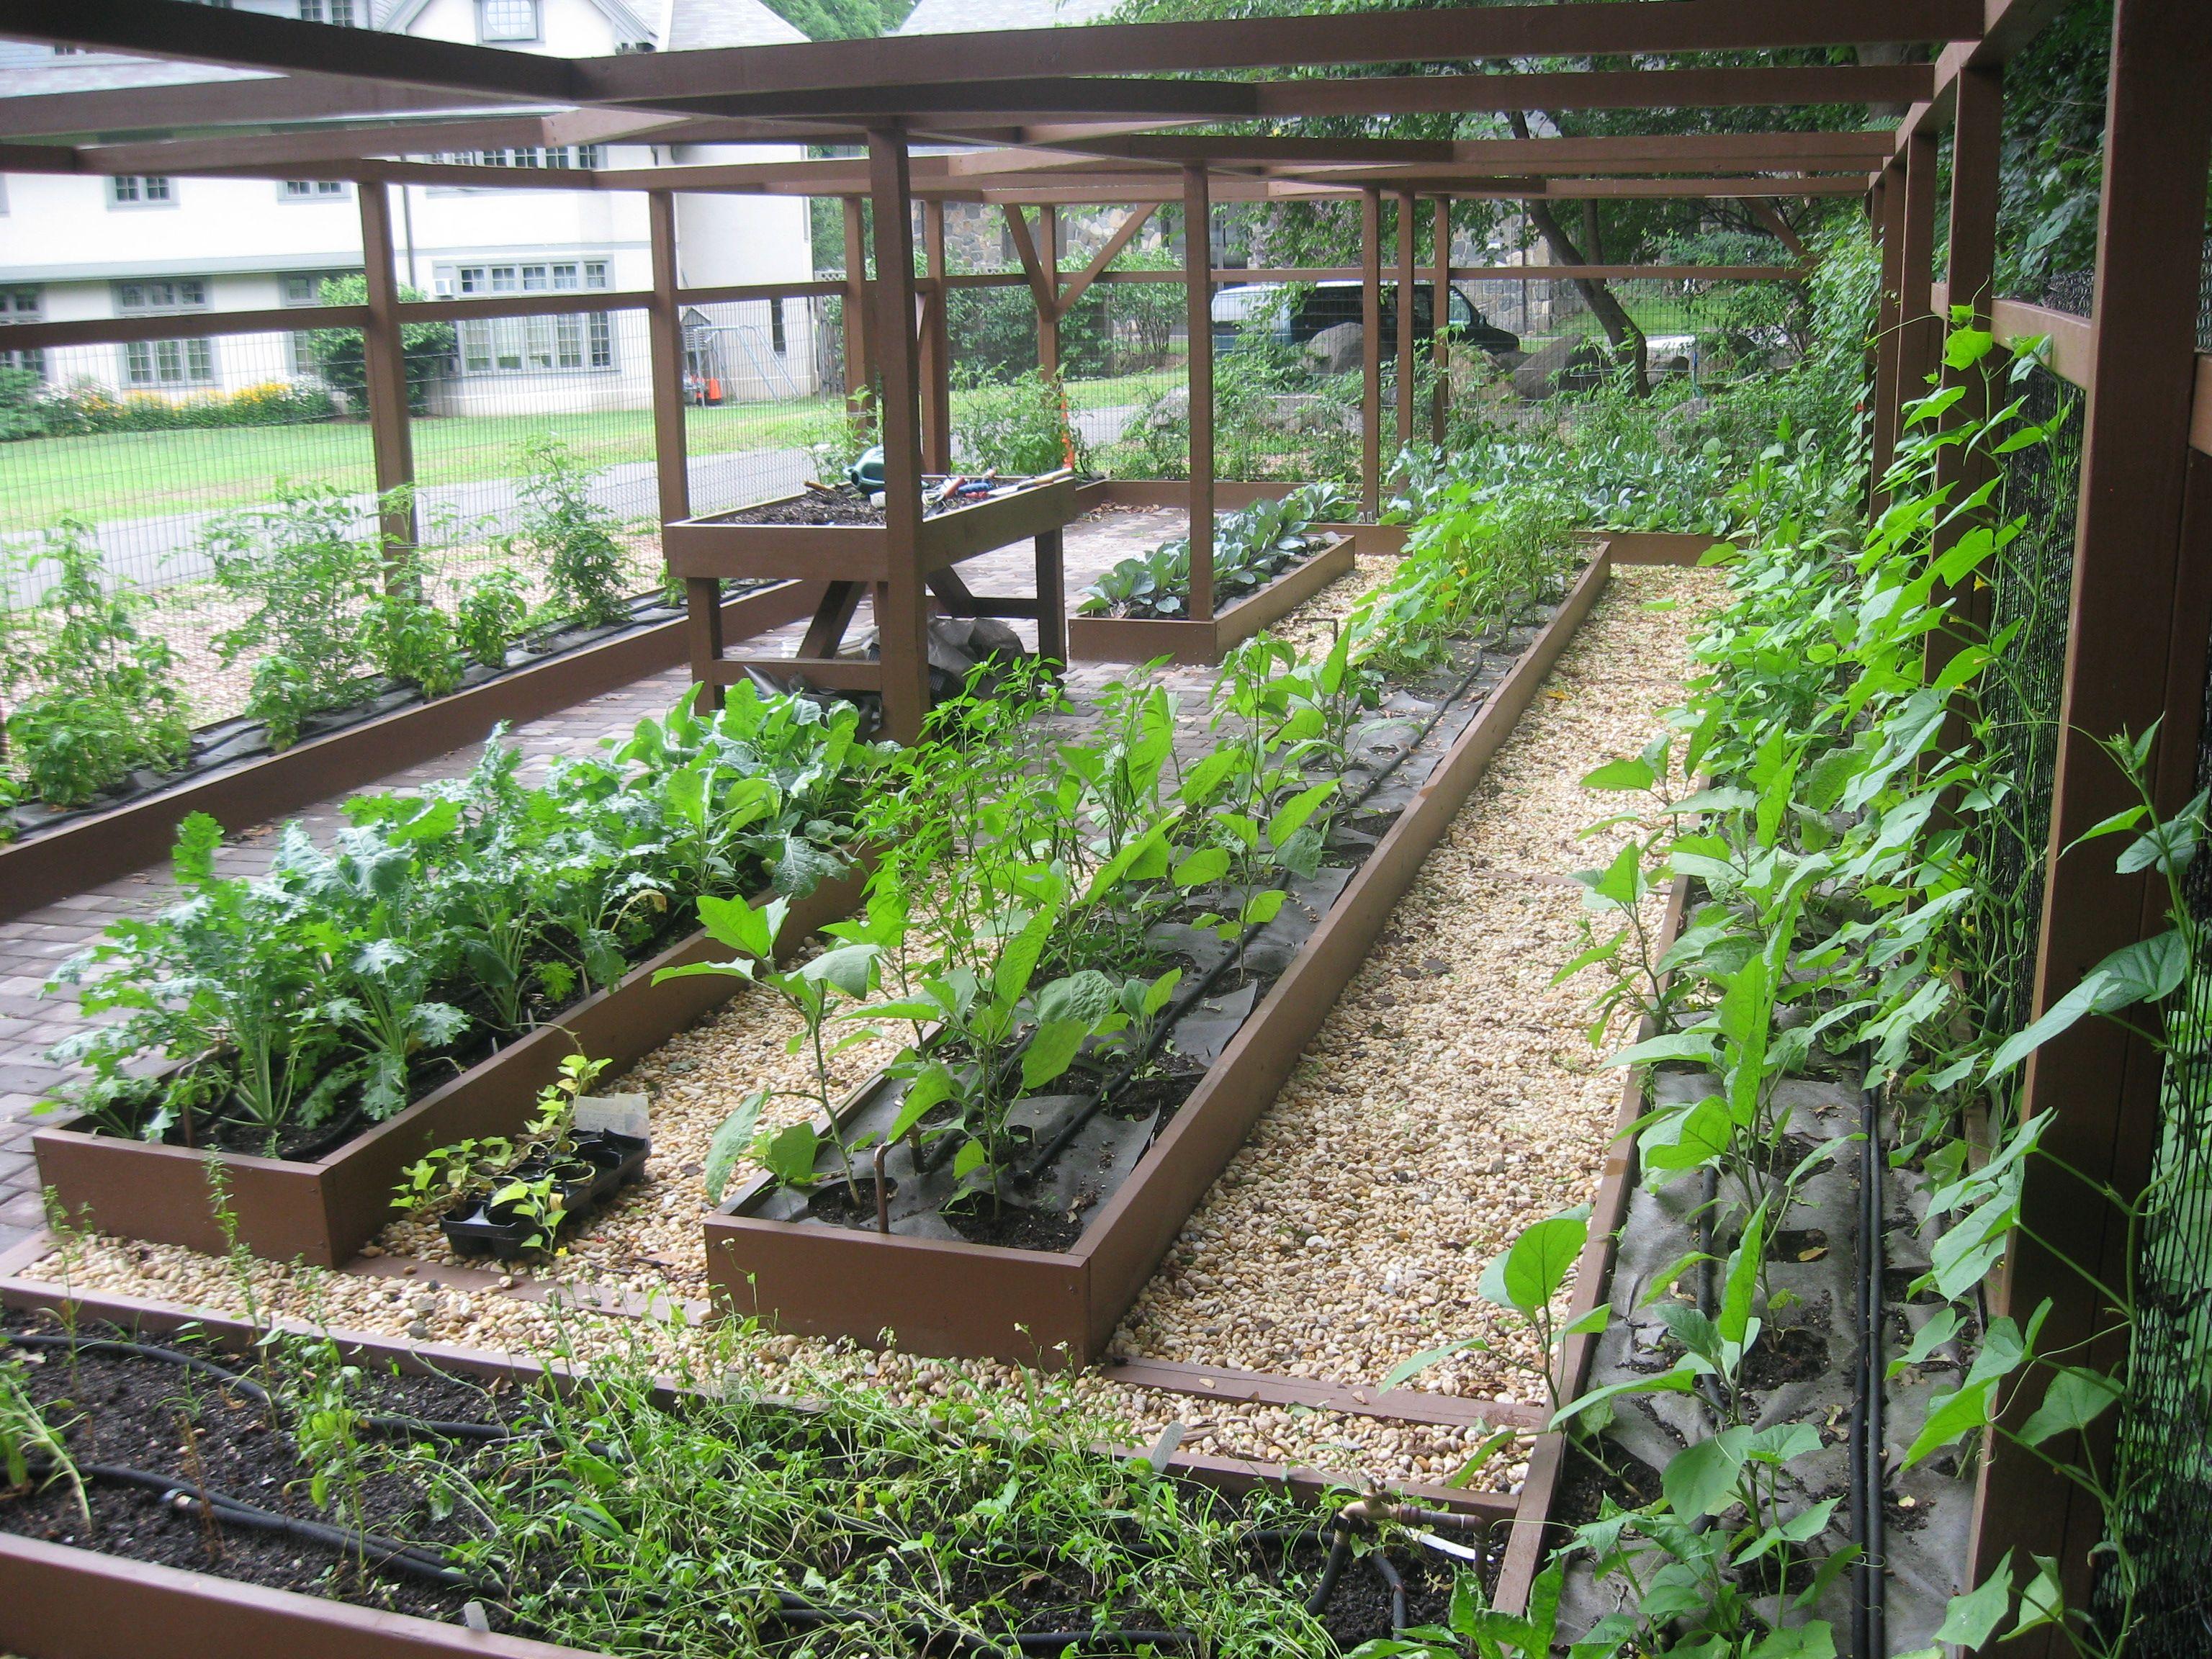 Secret landscaping landscaping ideas backyard ecosystems backyard vegetable gardensbackyard